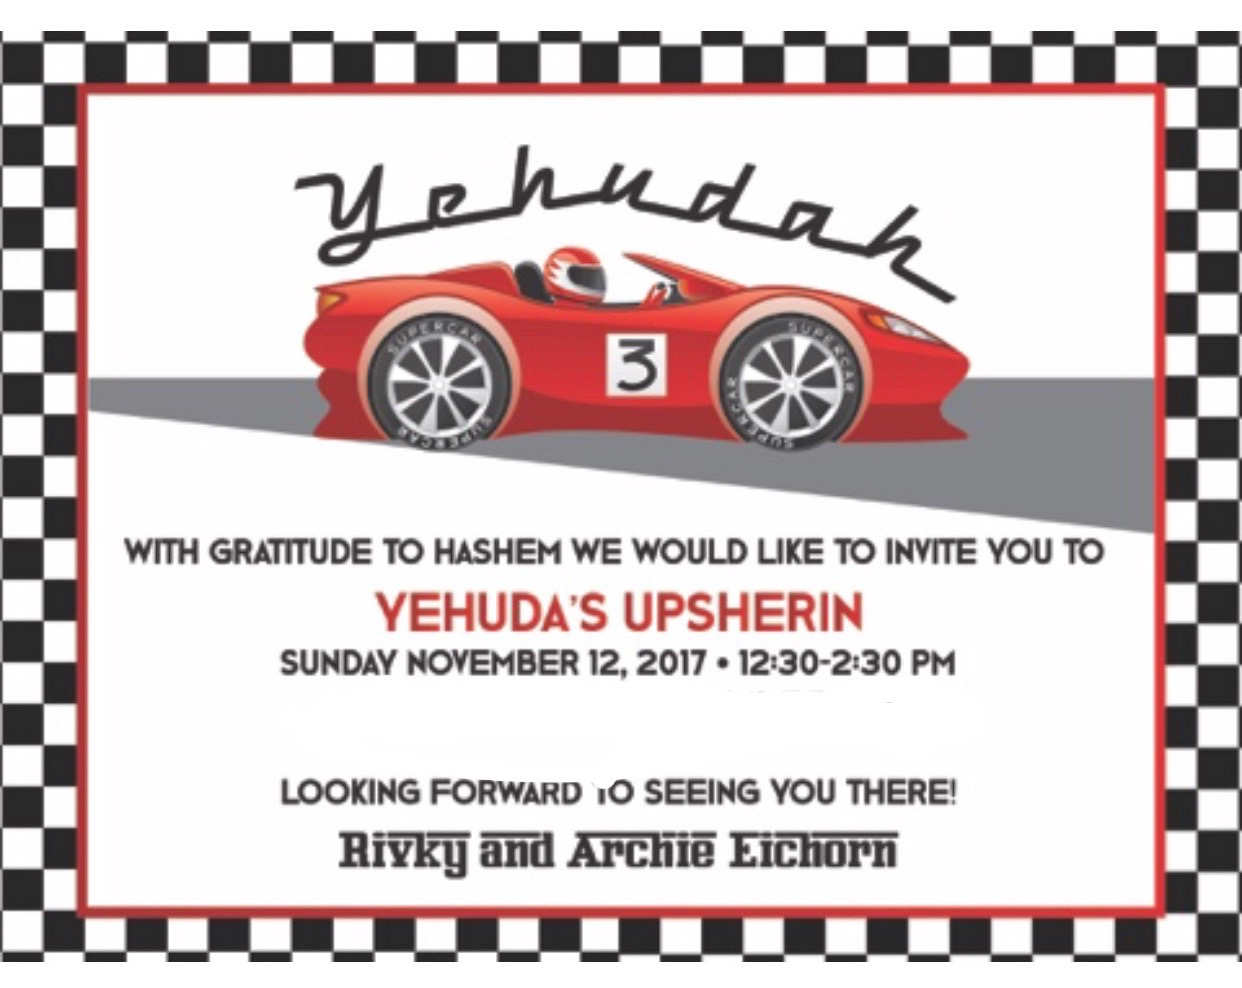 Race Car Upsherin Events 360